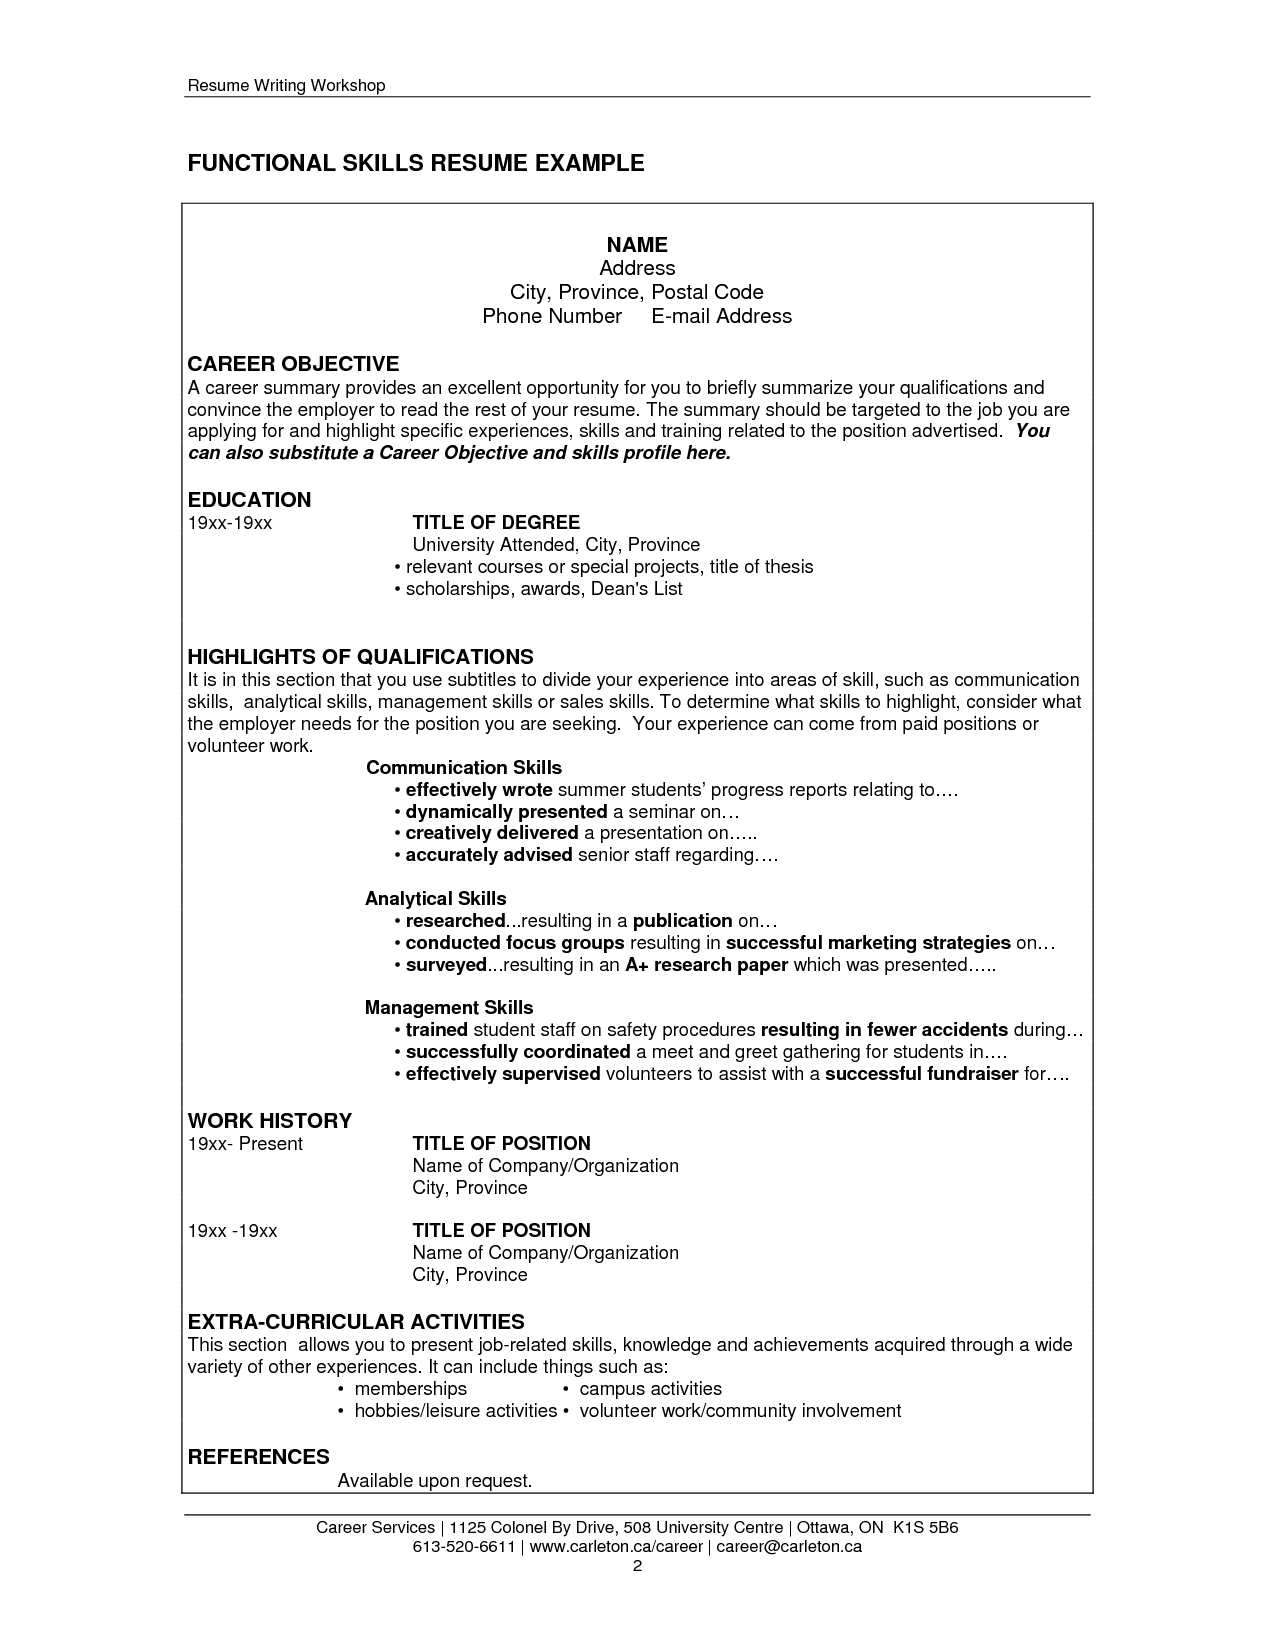 27 Example Of Skills On Resume Sample Resumes Resume Skills Section Resume Skills Good Resume Examples